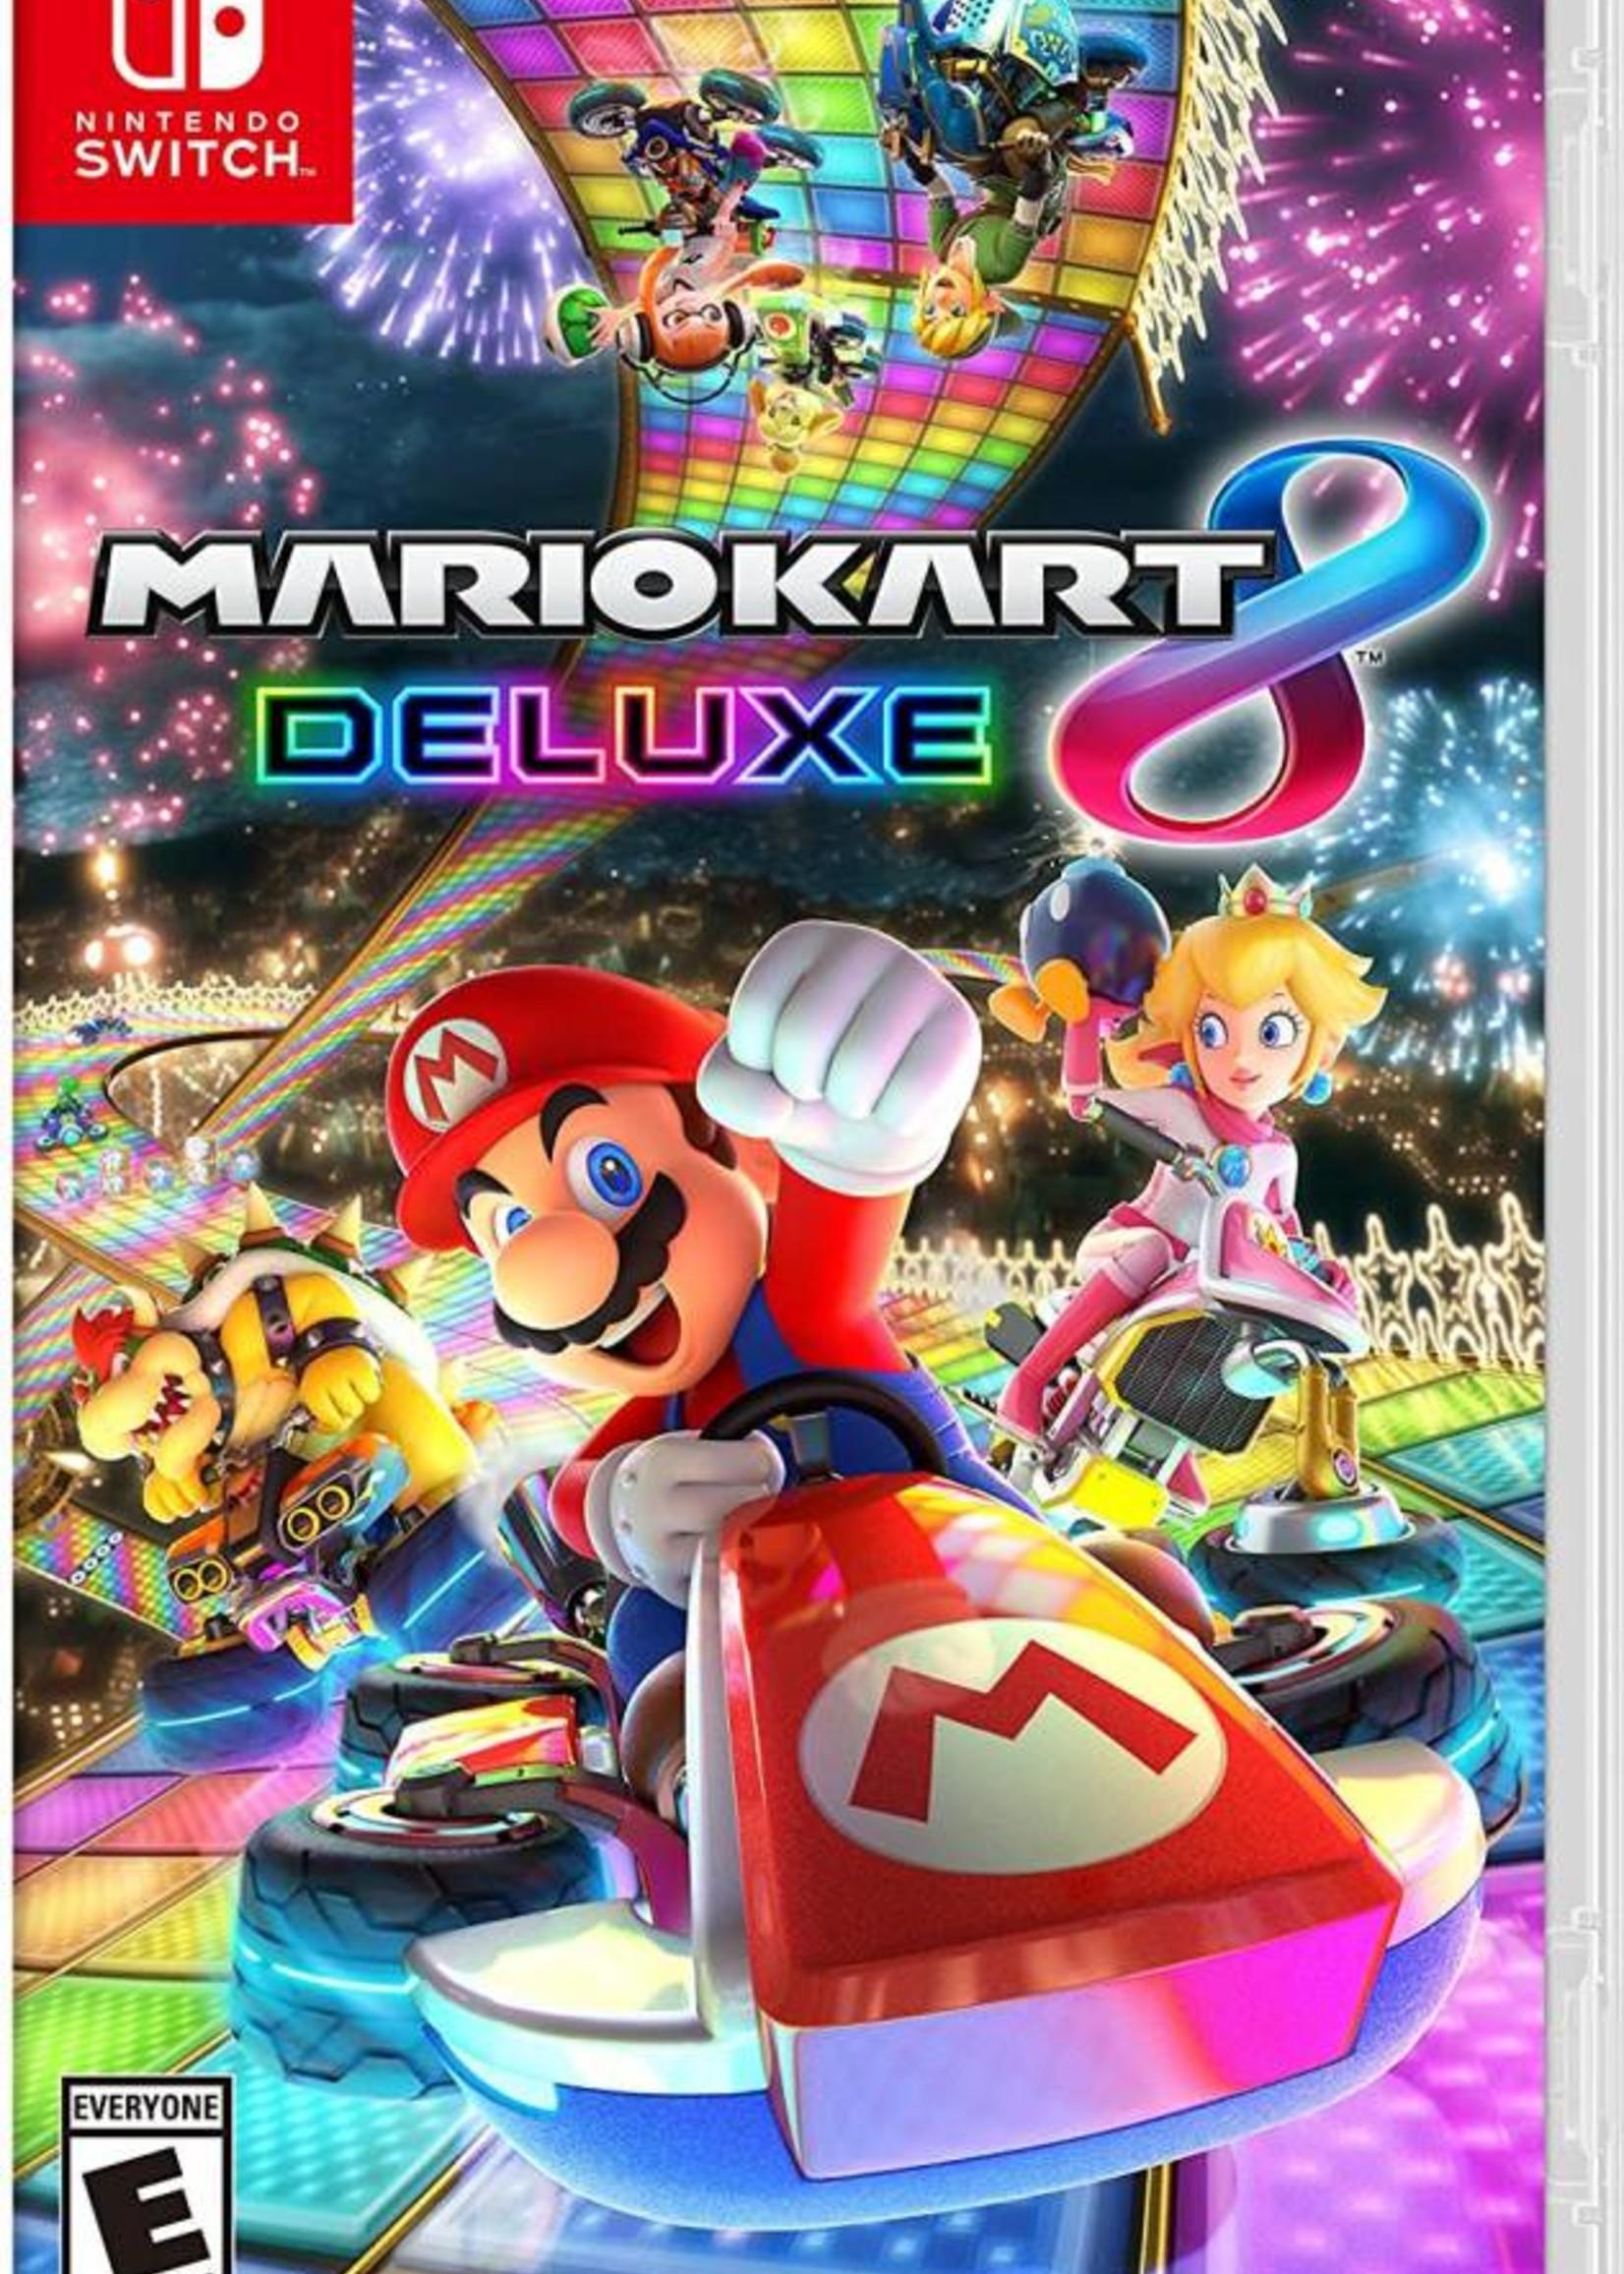 Mario Kart 8 Deluxe - SWITCH NEW